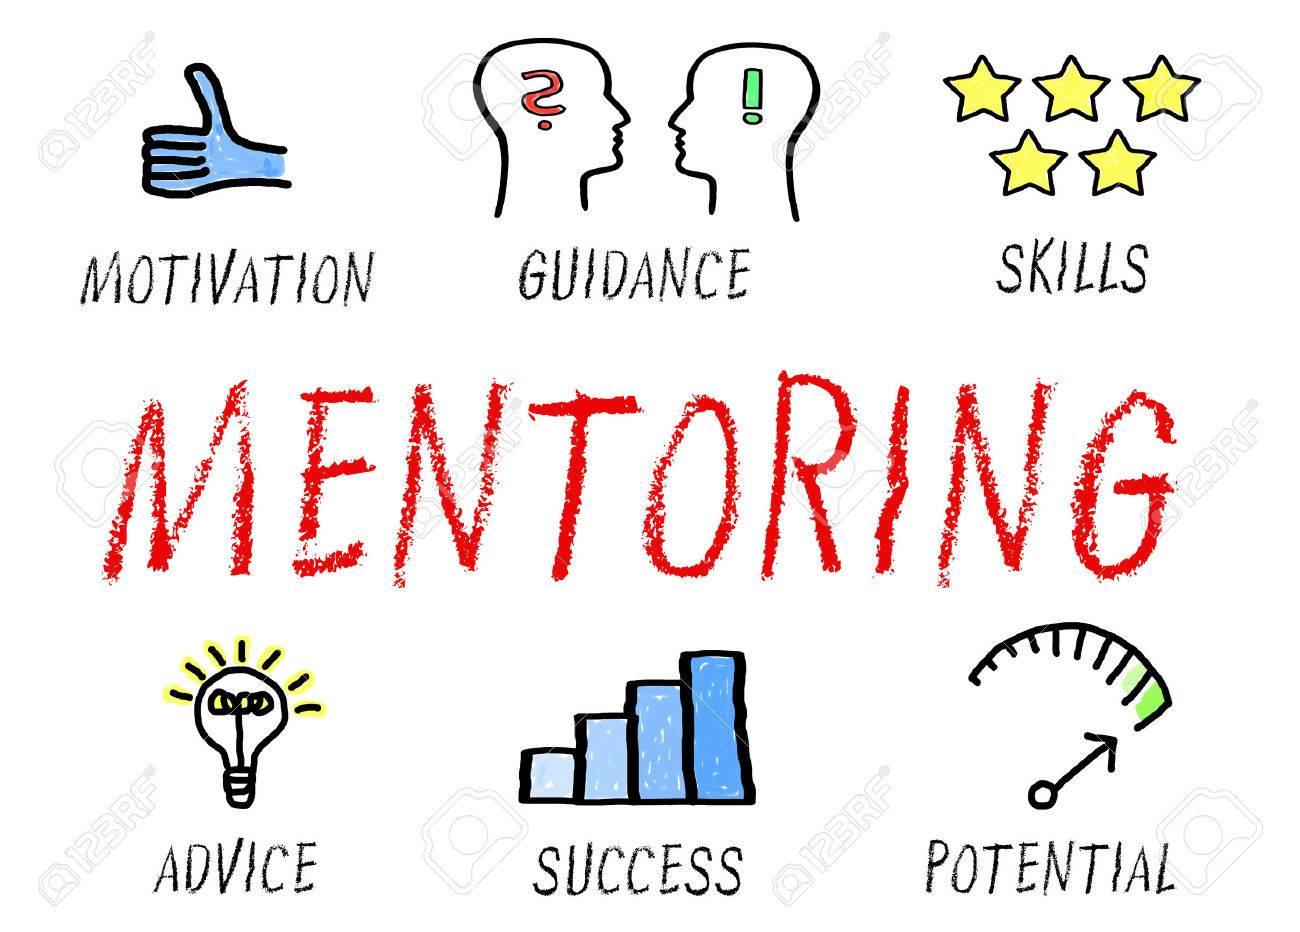 Mentoring - Business Concept - 48058235